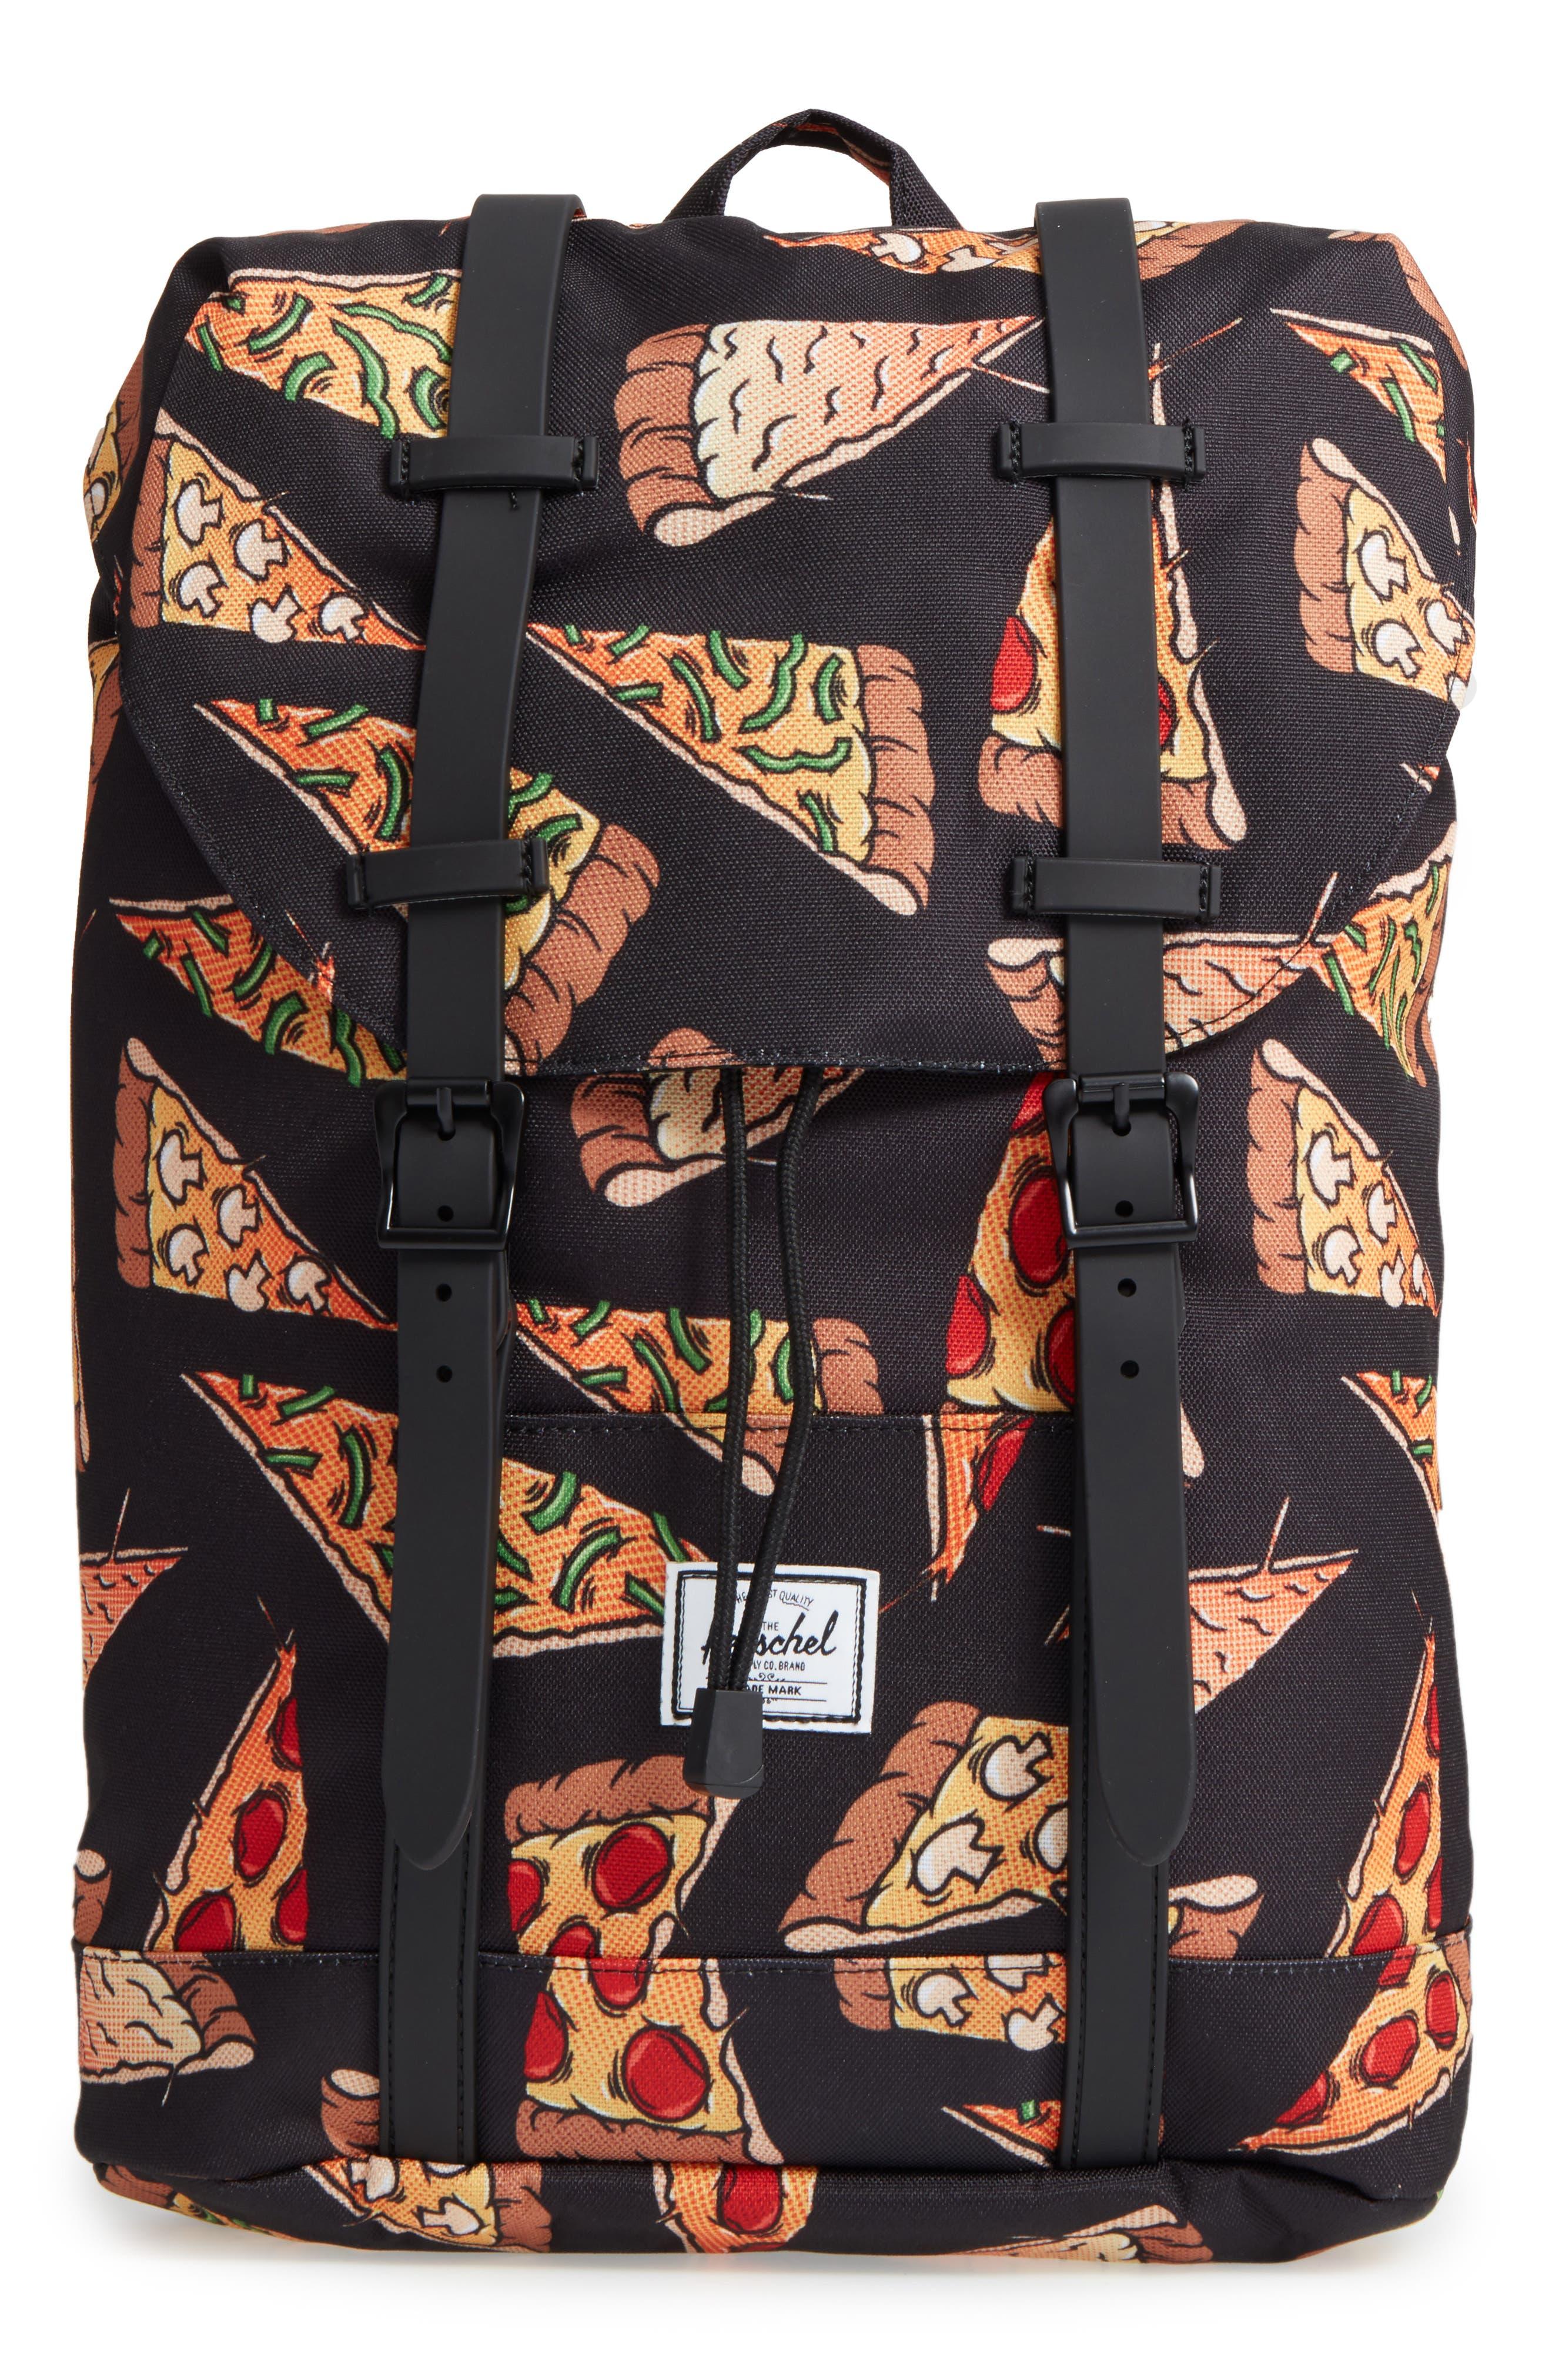 Retreat Backpack,                             Main thumbnail 1, color,                             Black Pizza